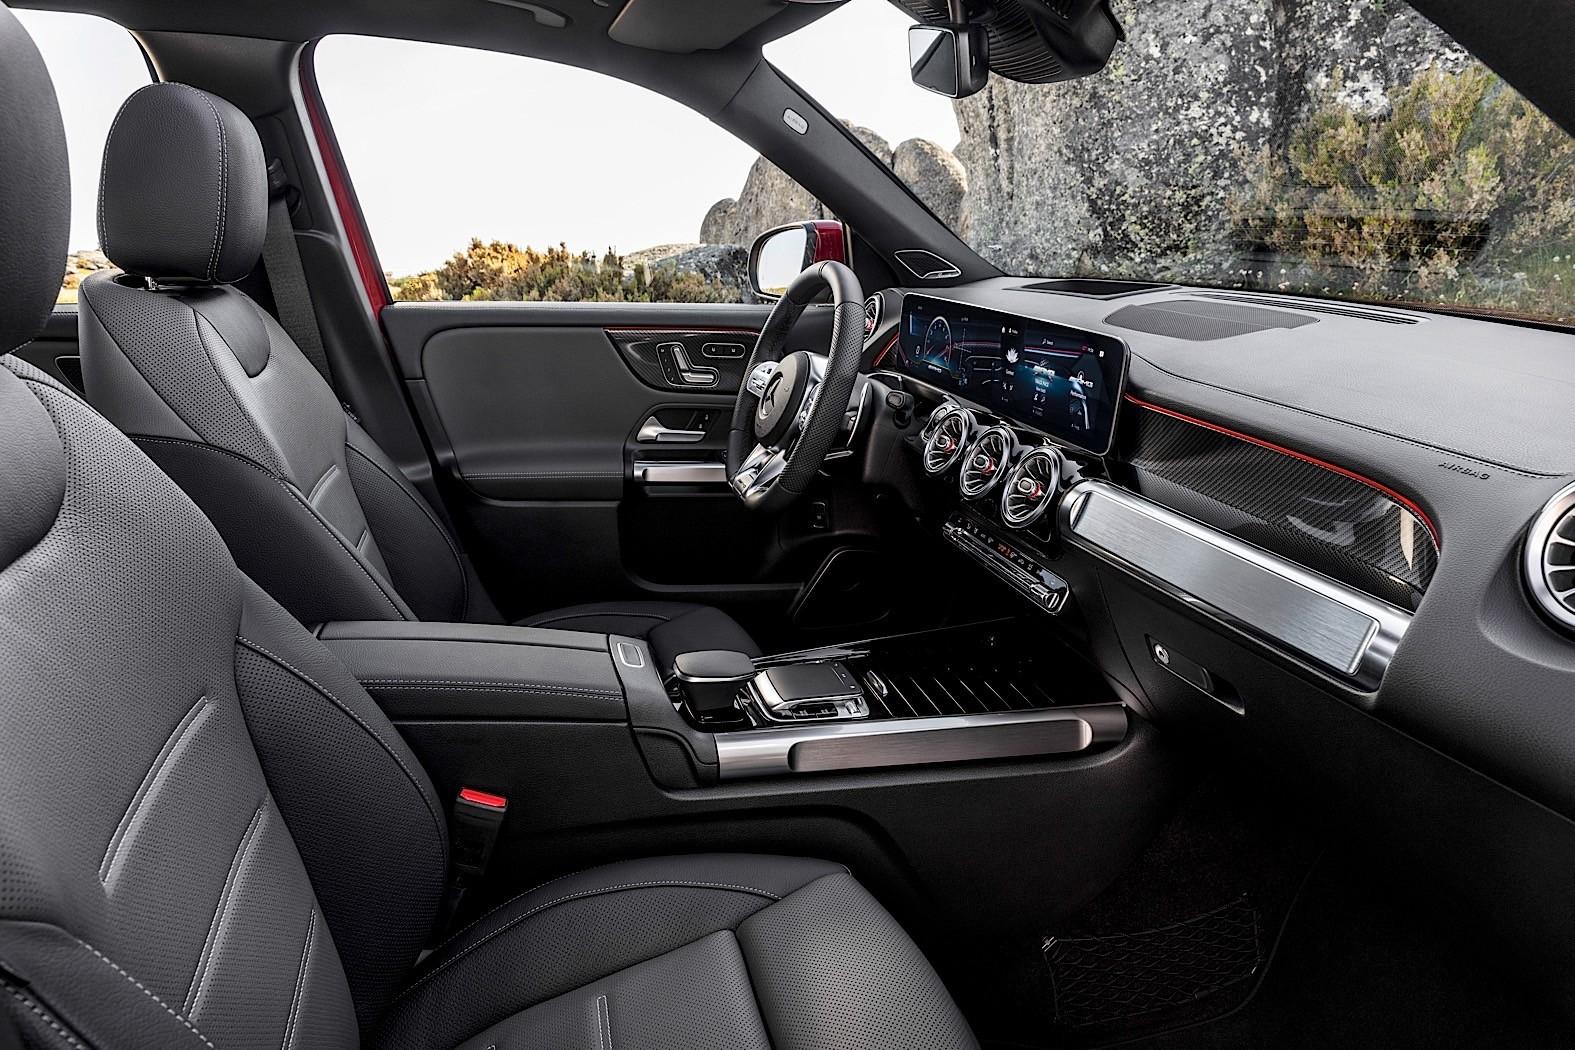 2020 Mercedes-AMG GLB 35 4MATIC Review - autoevolution